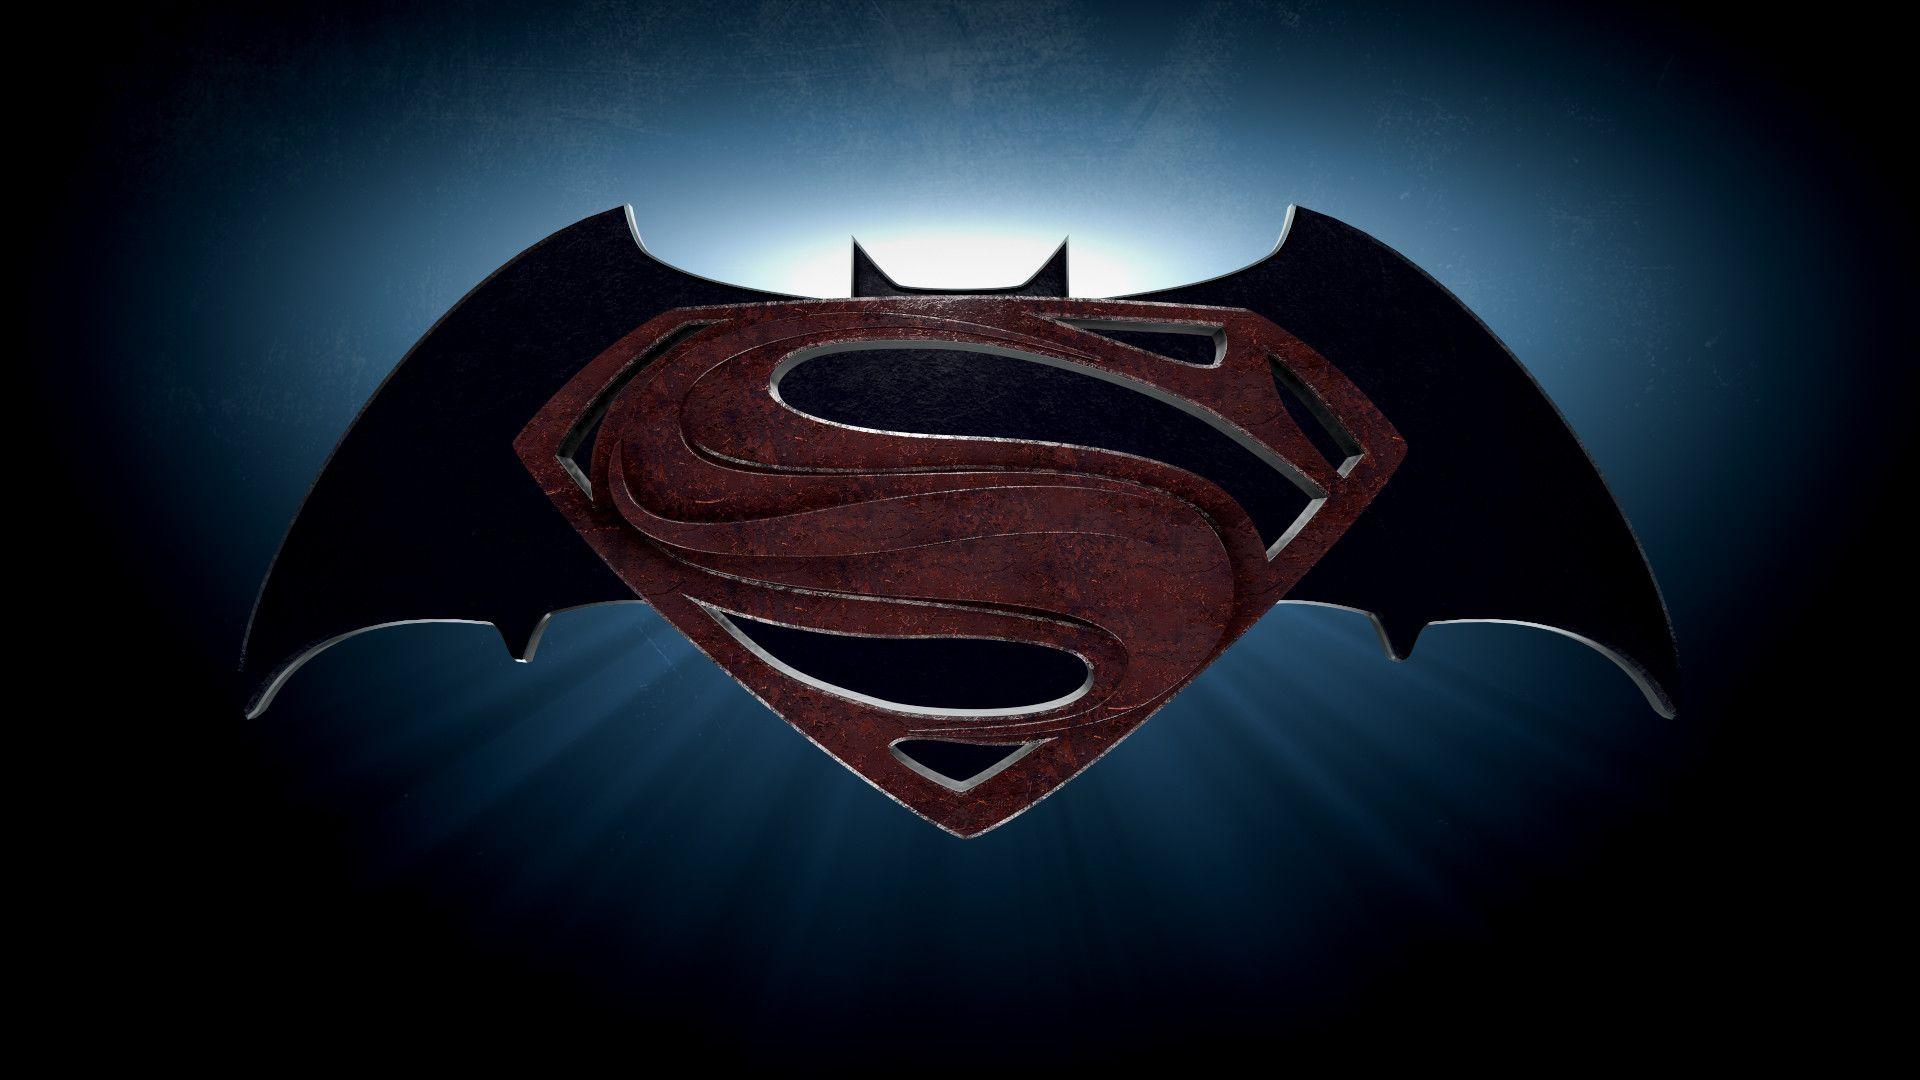 Batman Vs Superman Logo Wallpaper 4125 Resolution